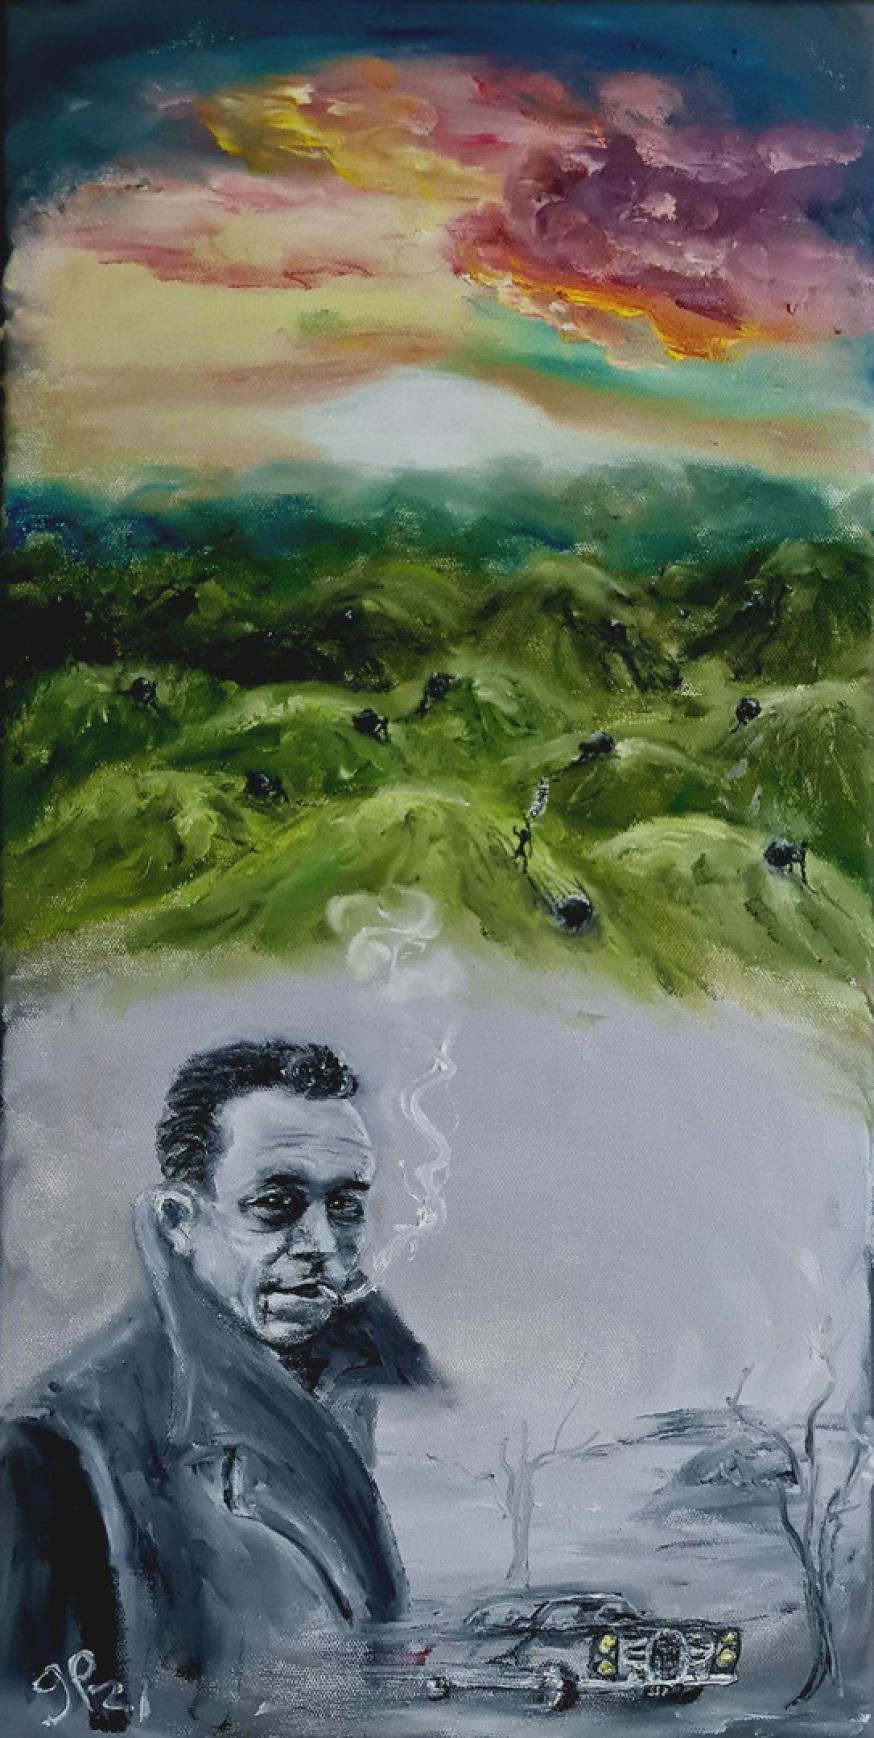 Absurde, Camus, Sisyphos, Freiheit, Facel Vega